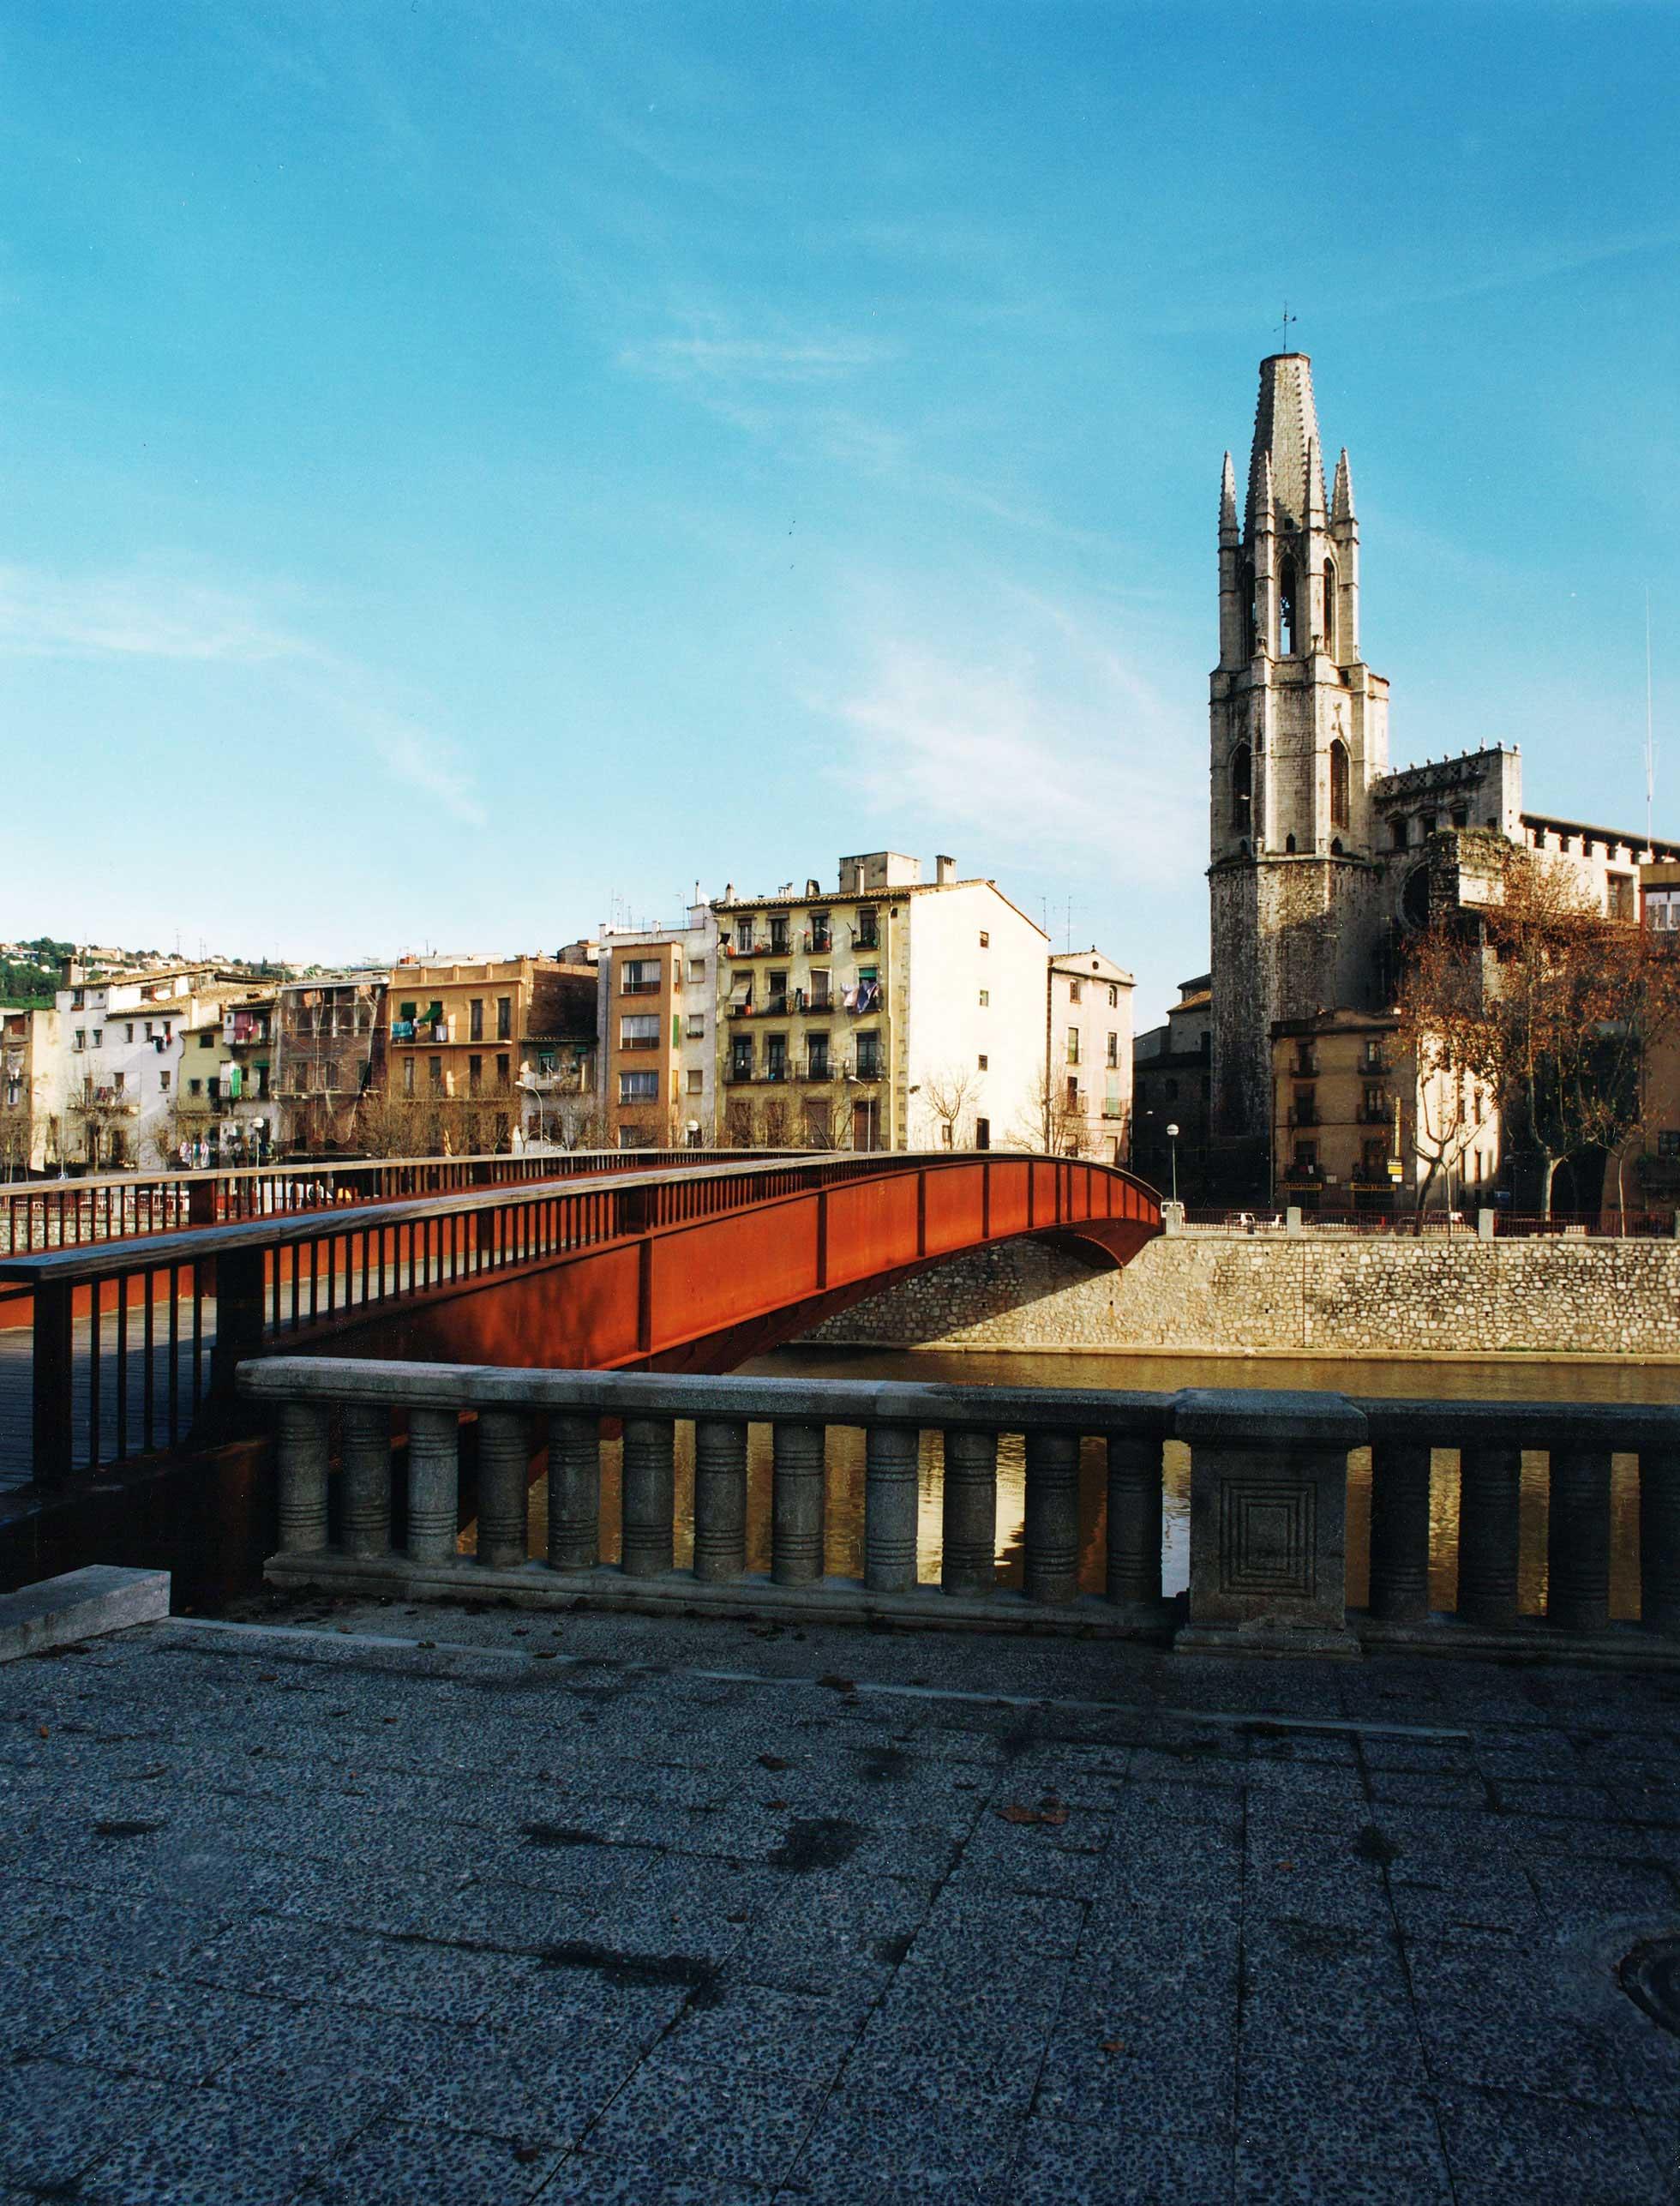 Pasarela Sant Feliu, Girona 2